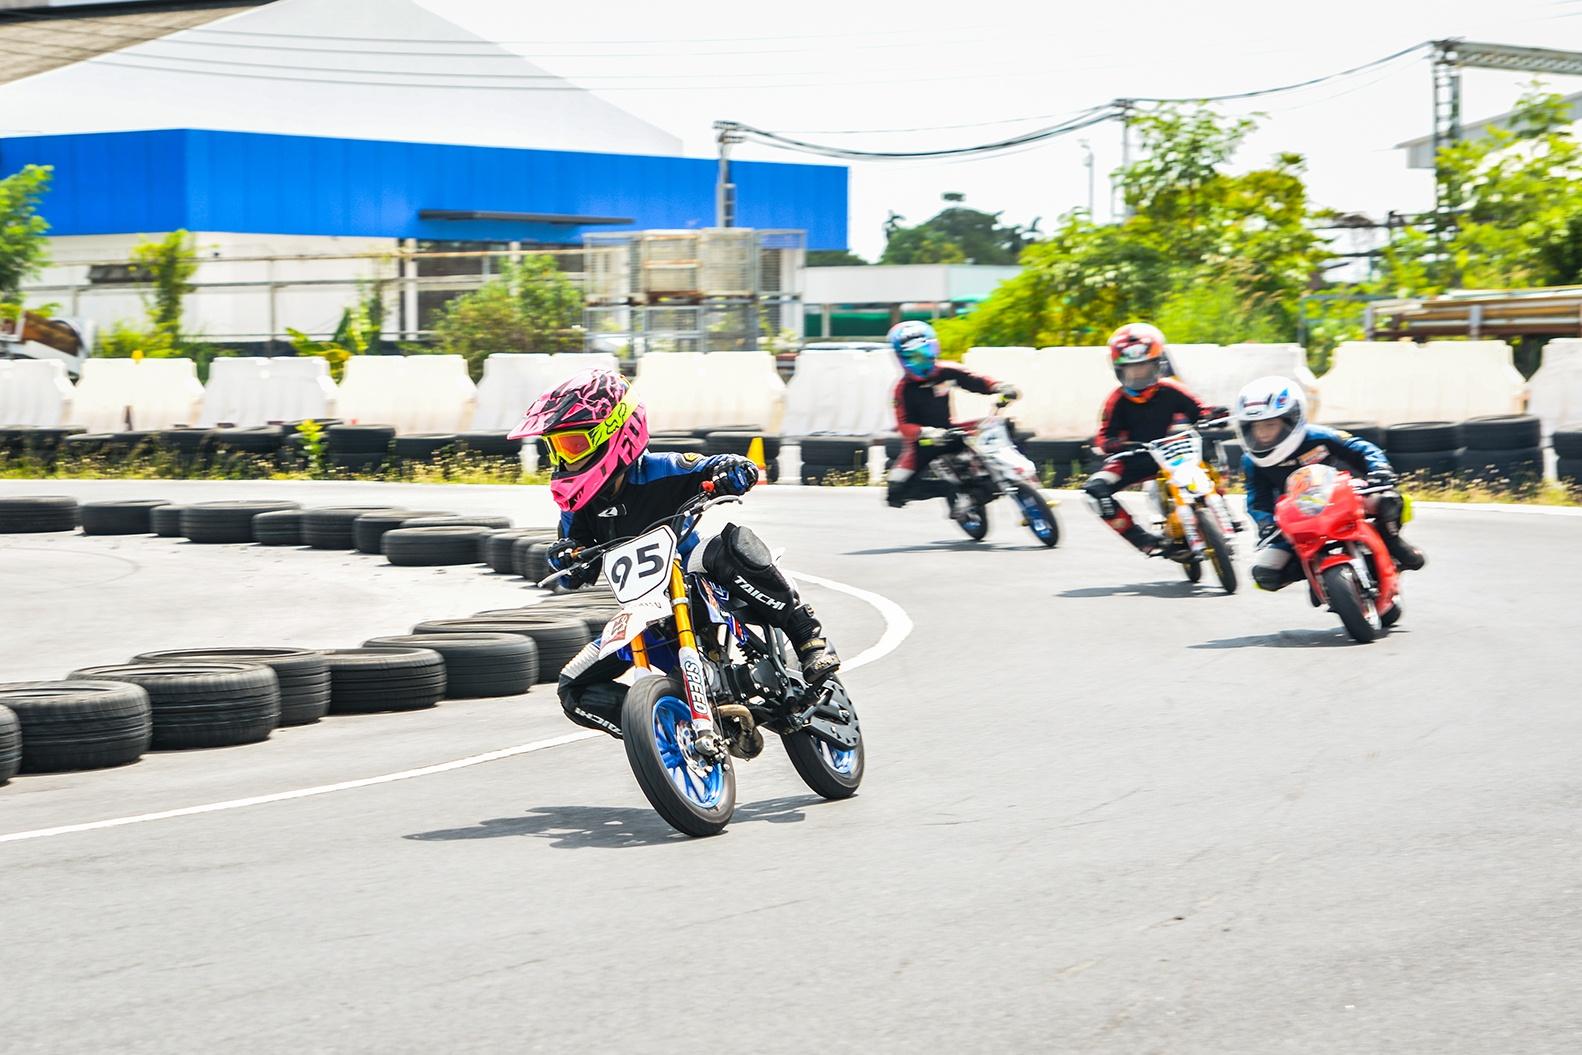 Giai dua moto tre em o Thai Lan va nhung giac mo MotoGP hinh anh 34